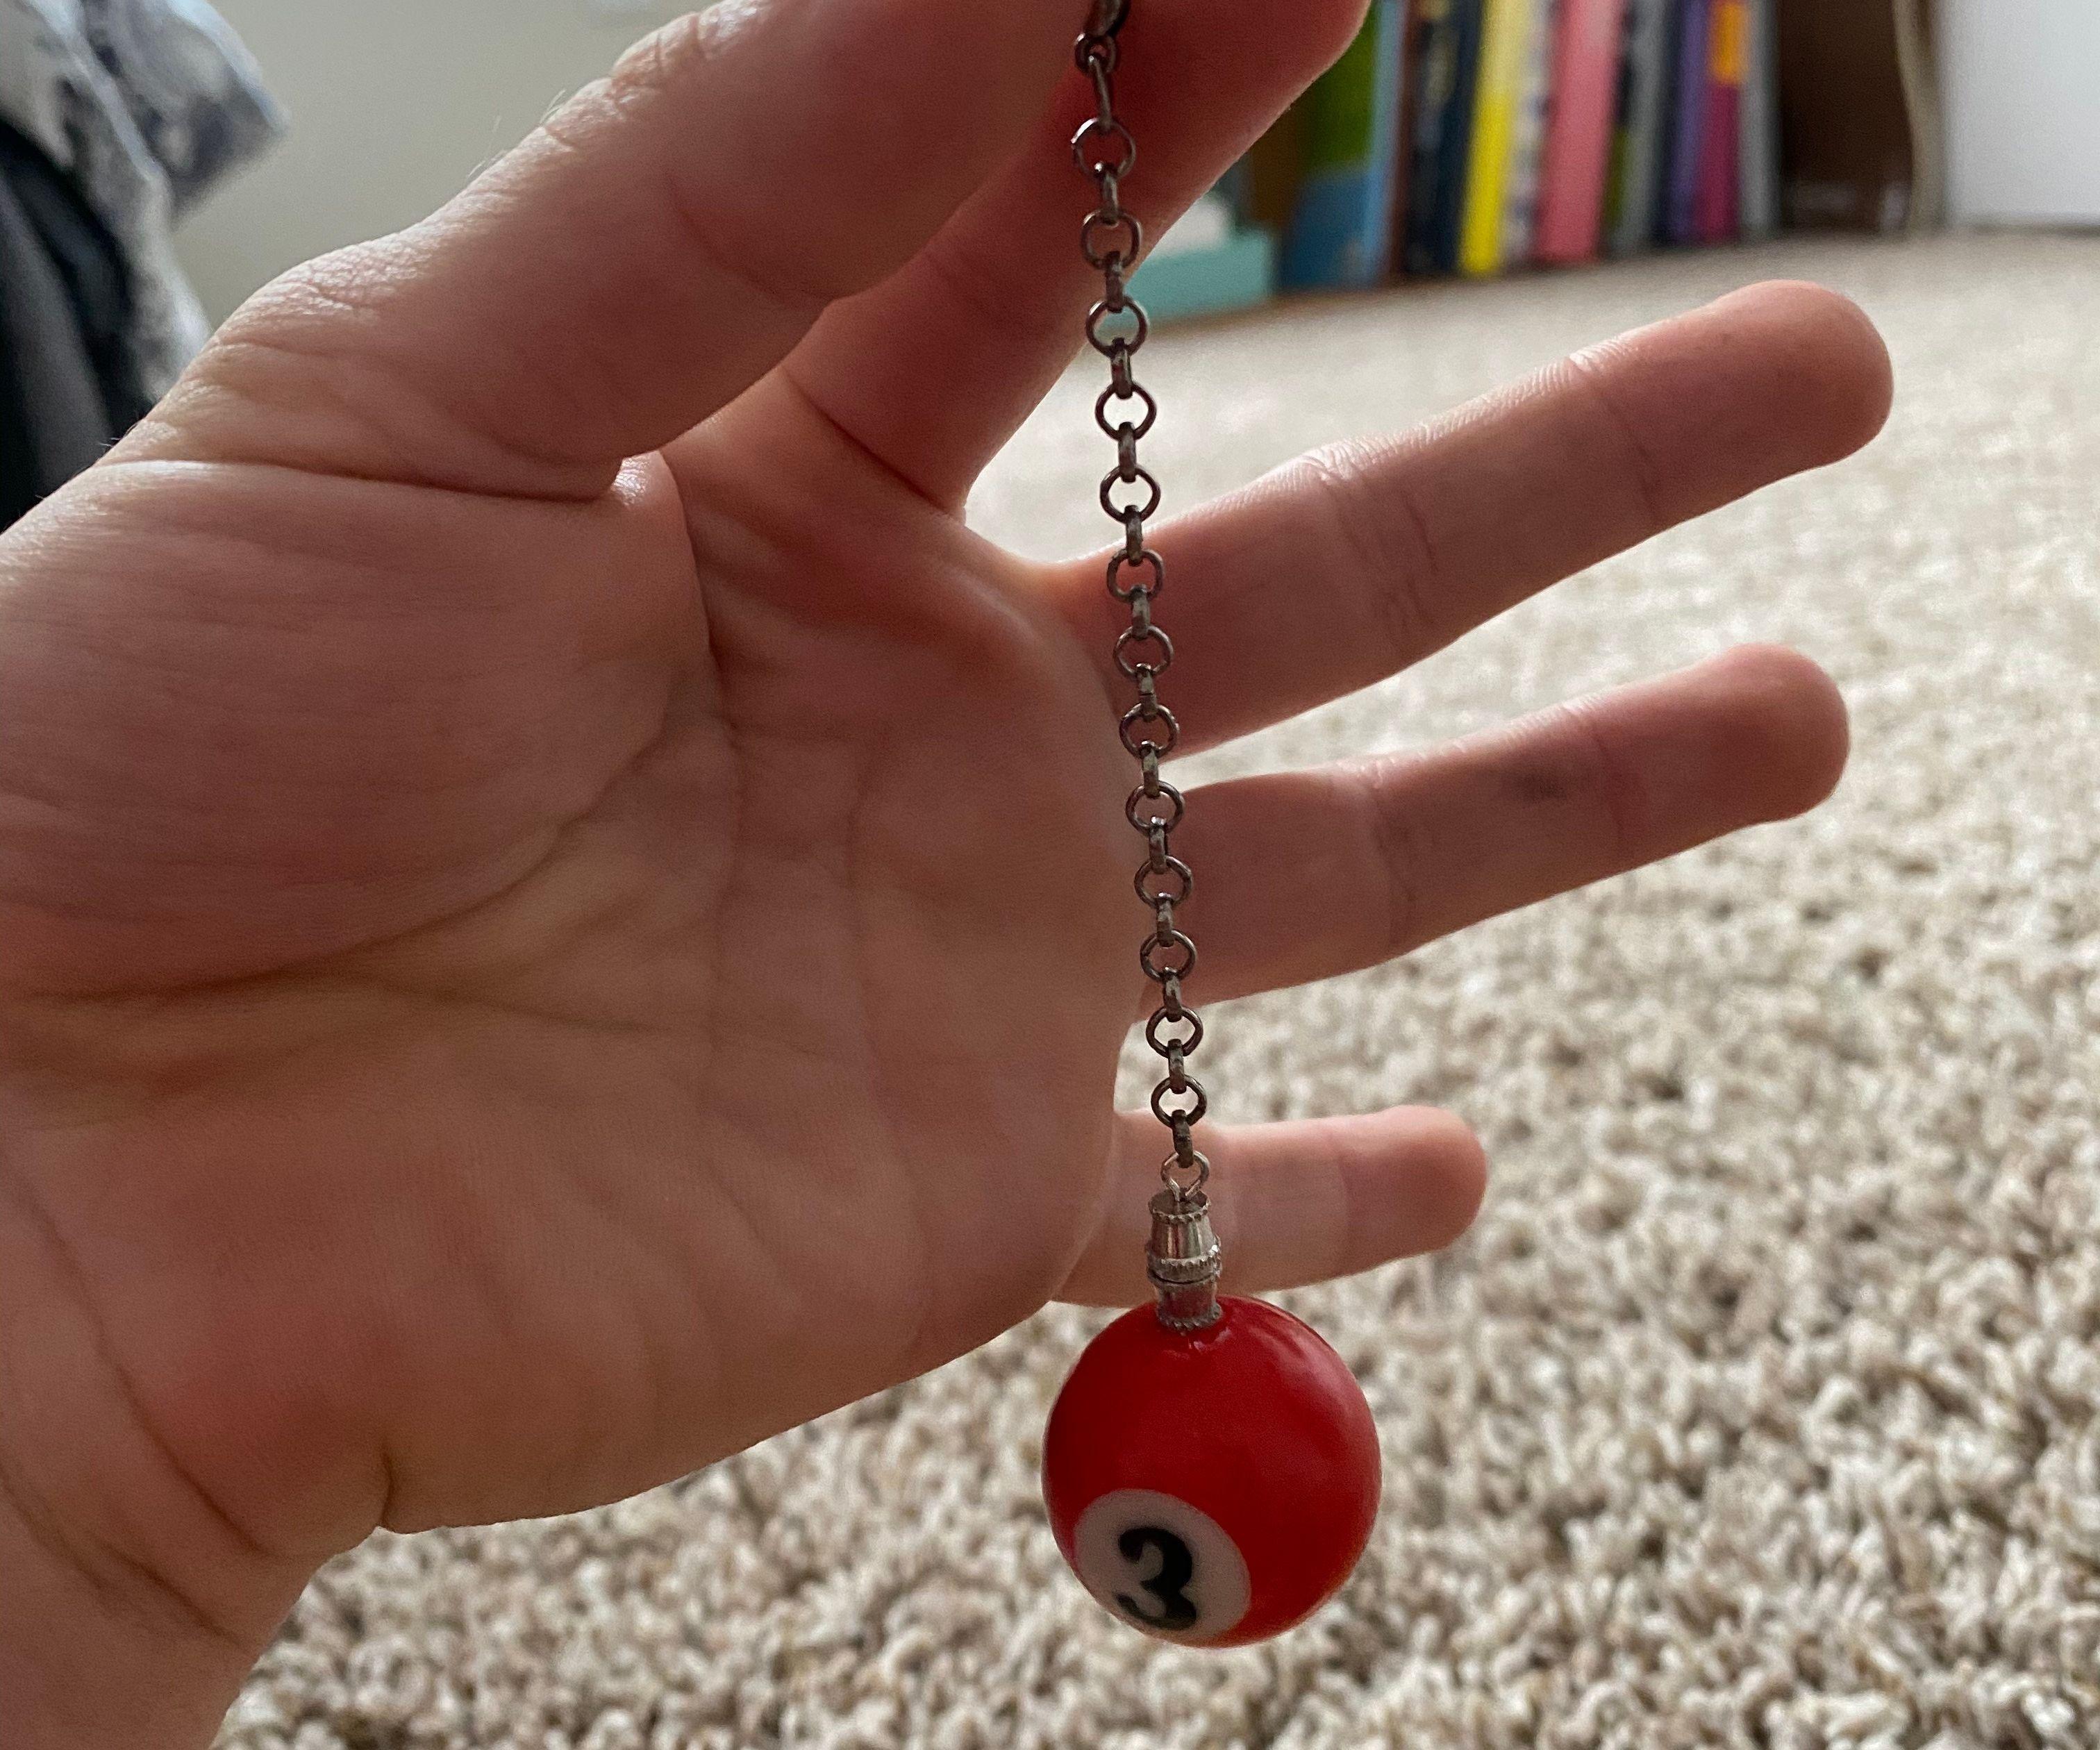 Mini-Pool Ball Keychain